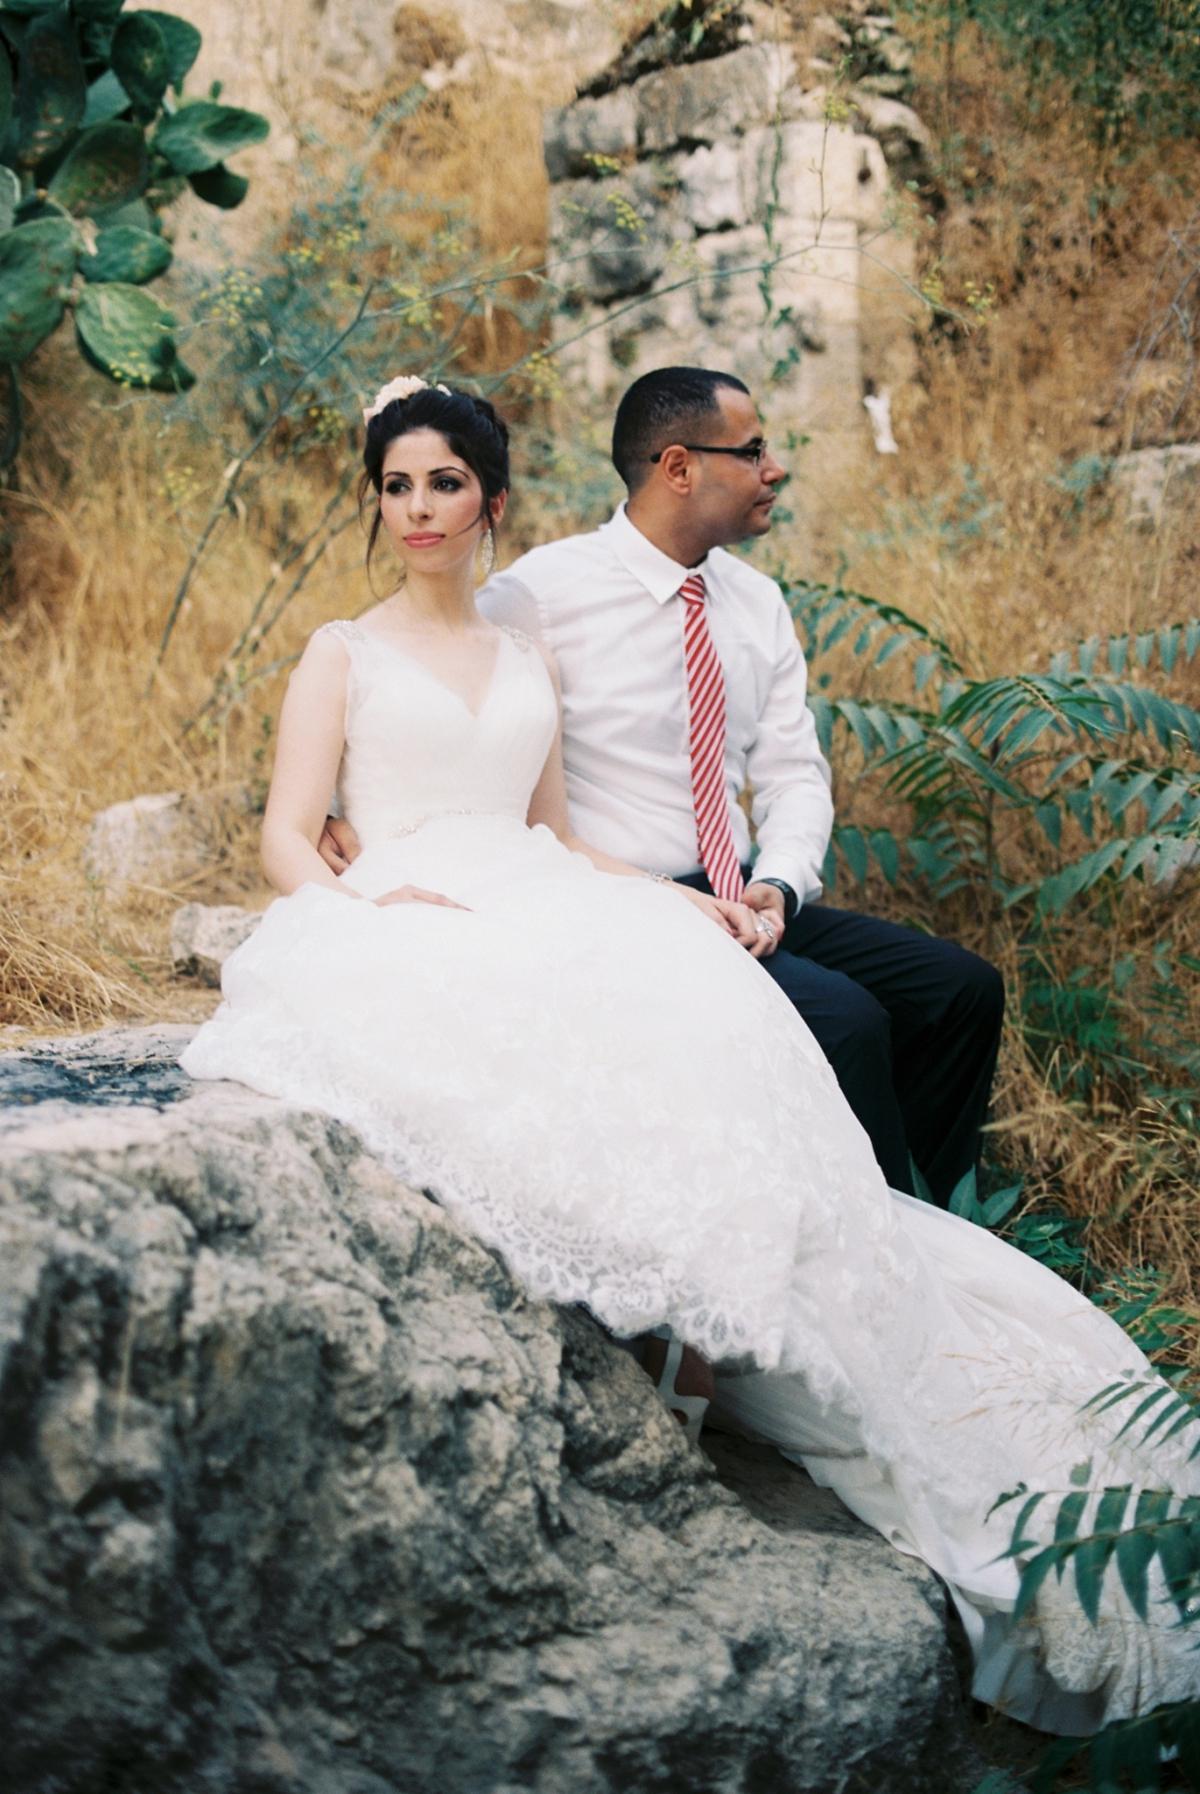 Lifta Bridal Portraits - Jerusalem Israel - Muna and Ali - Sigala Photography_0013